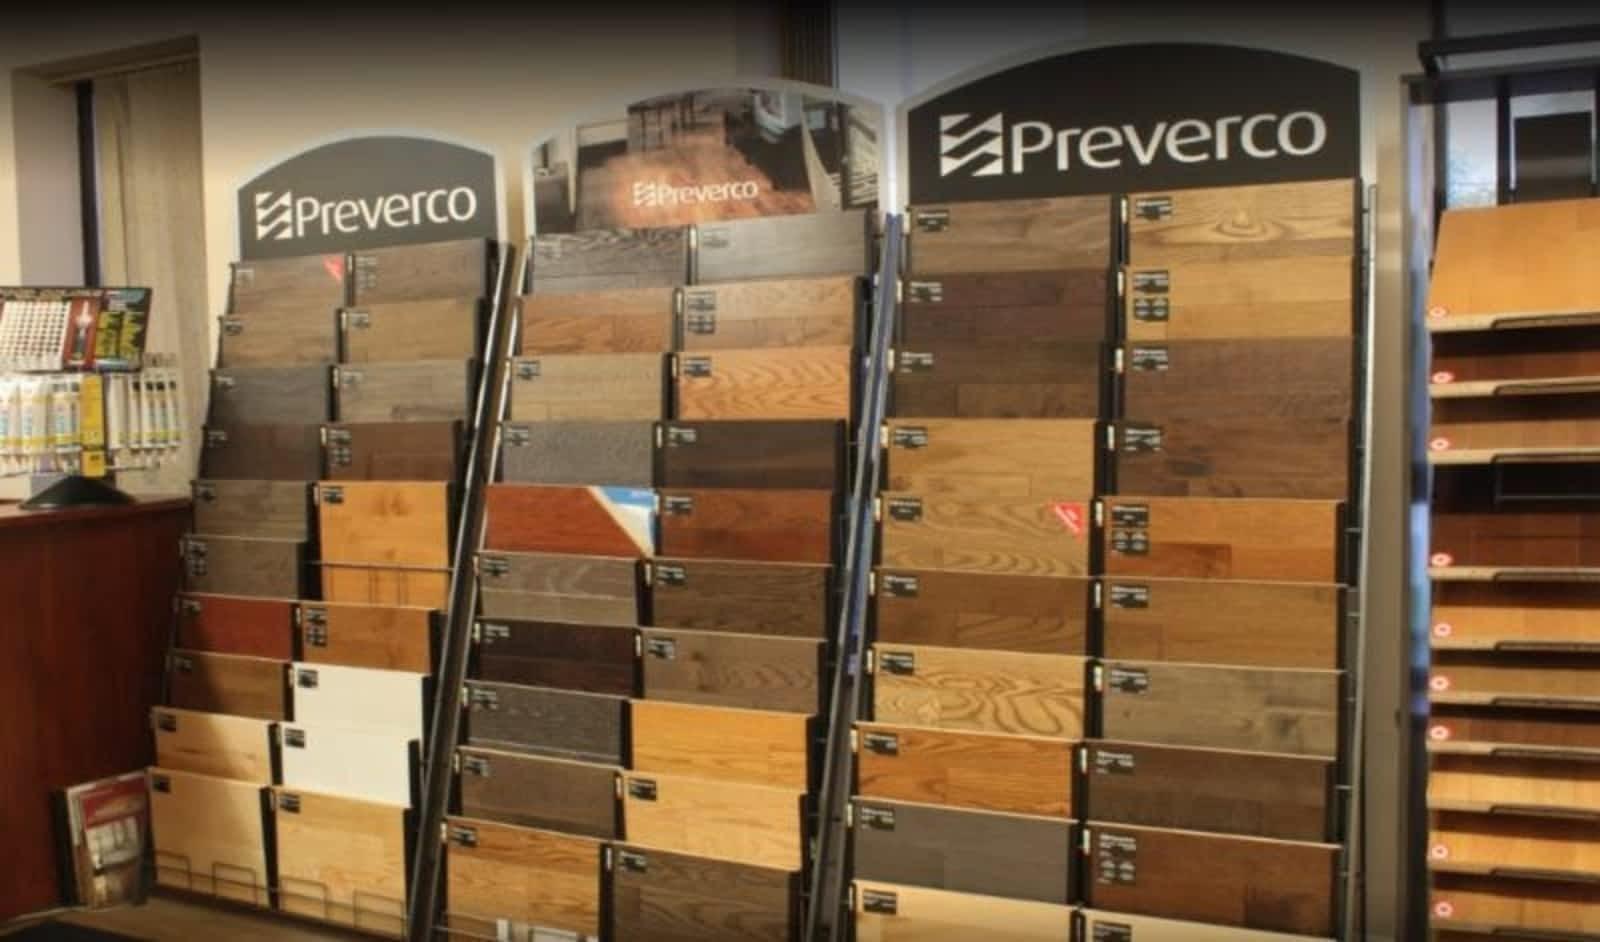 28 Nice Hardwood Flooring Ontario Ca 2021 free download hardwood flooring ontario ca of aa floors and more opening hours 524 evans ave etobicoke on pertaining to aa floors and more 7